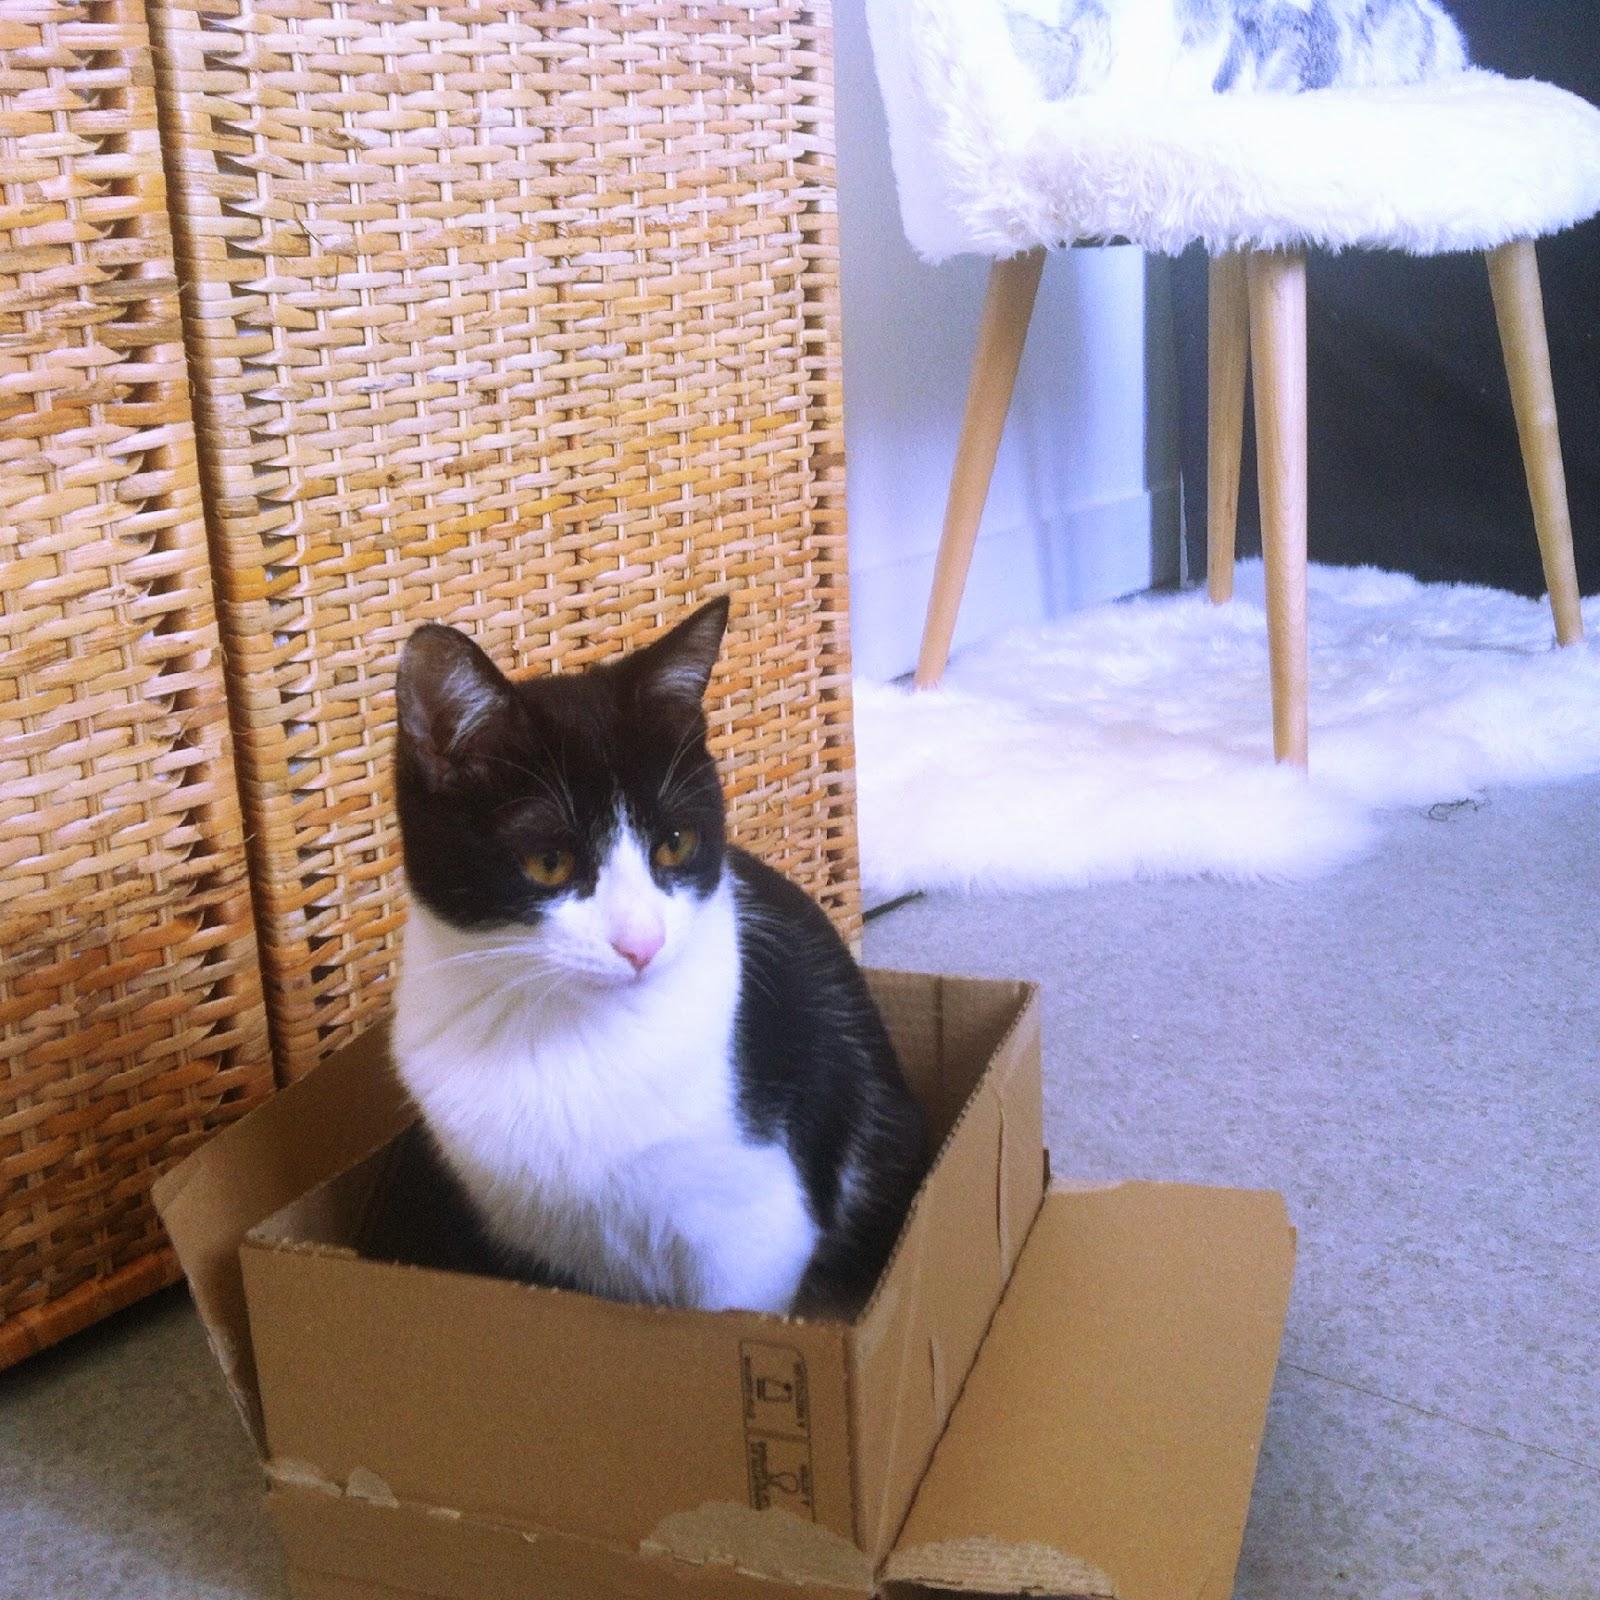 chat dans son carton